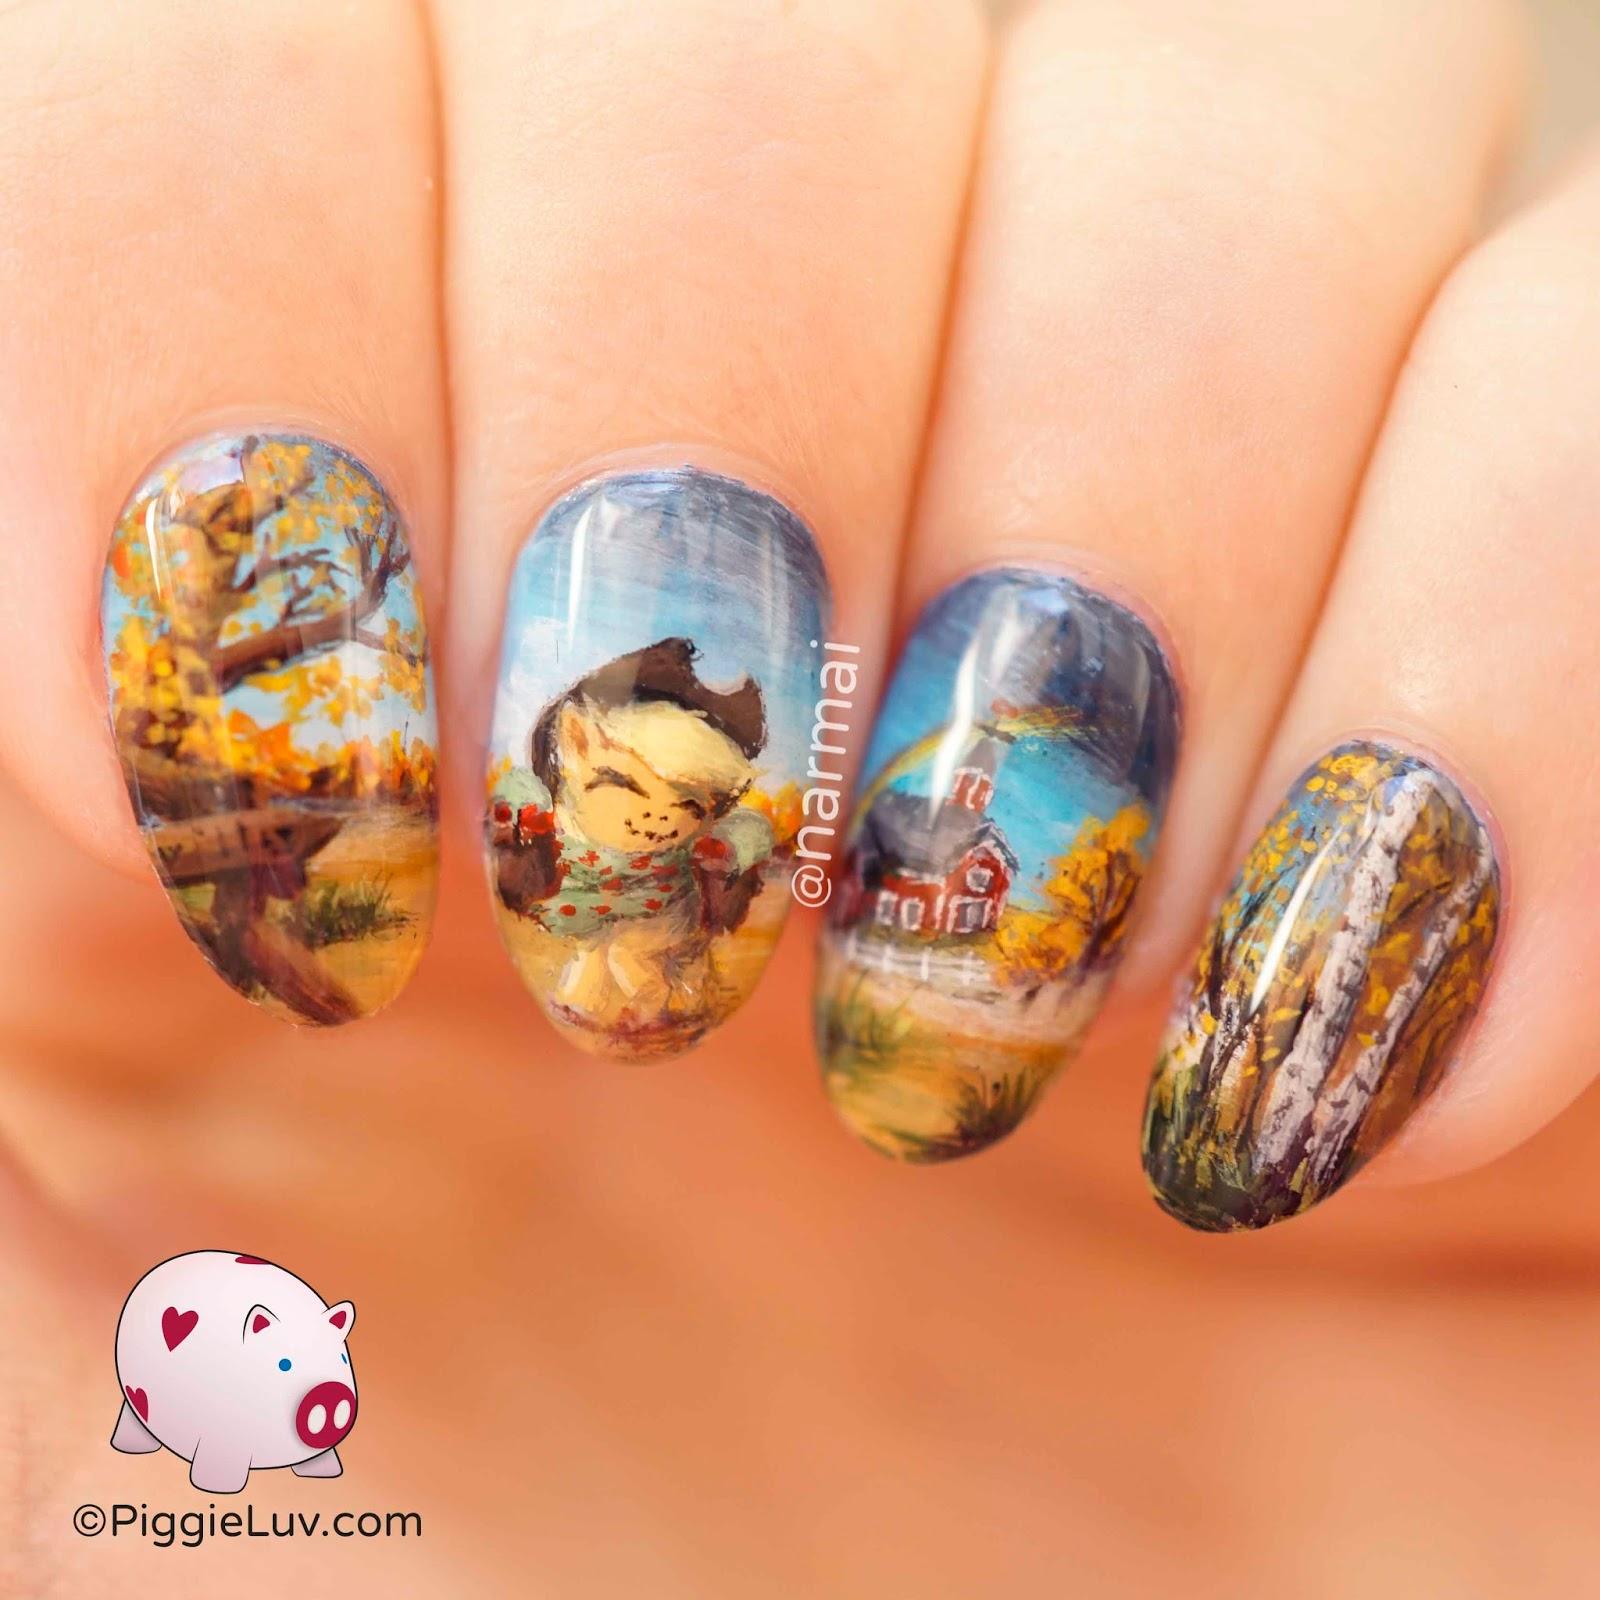 PiggieLuv: Autumn Applejack nail art